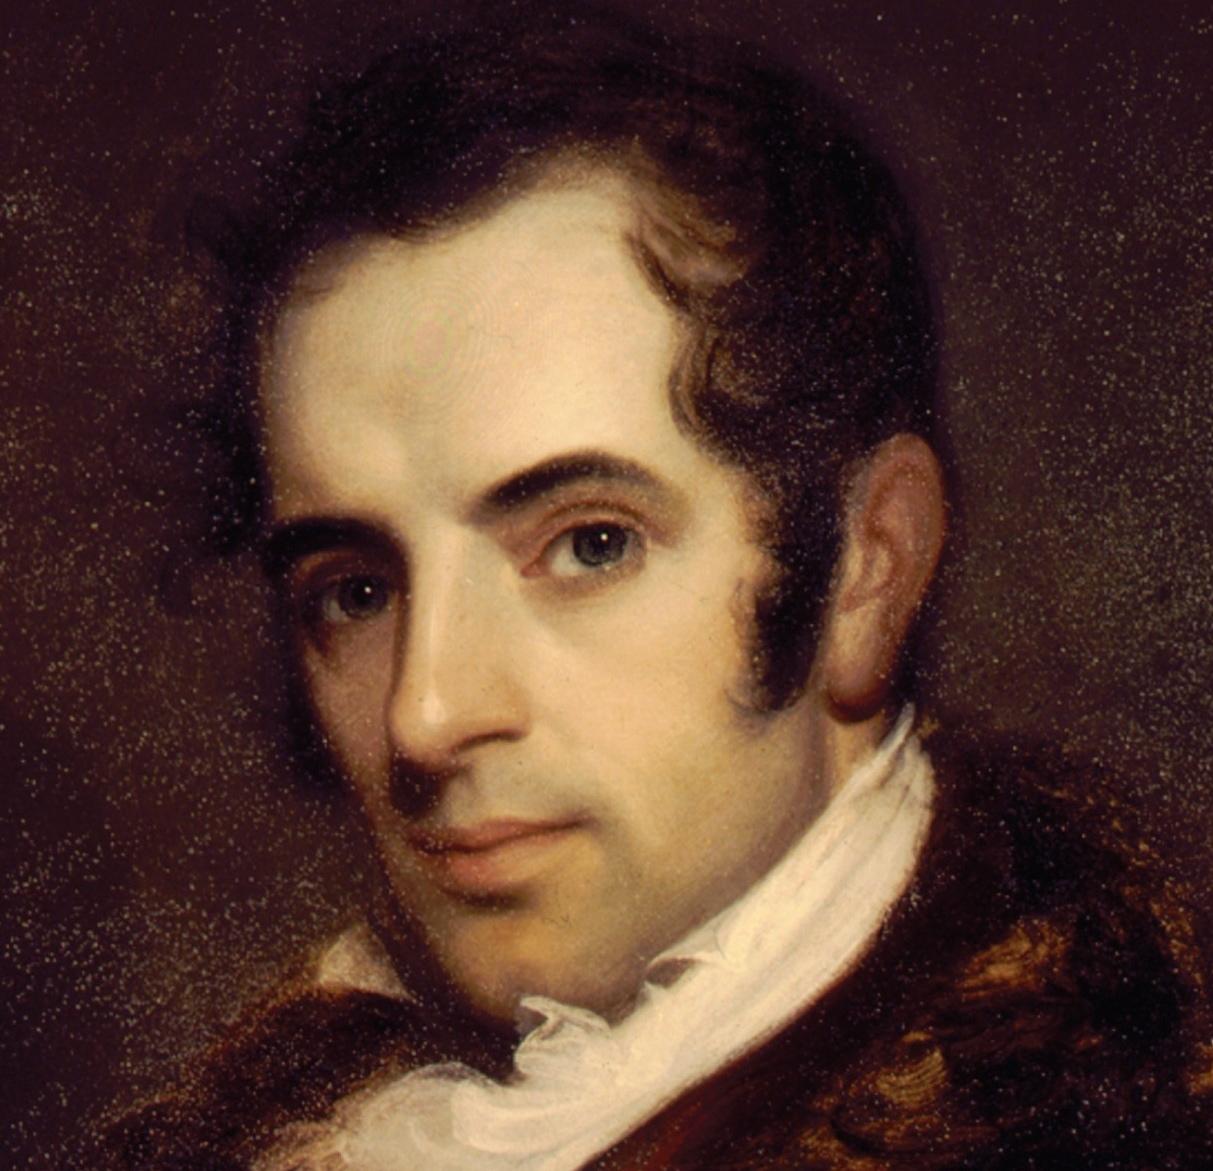 Washington irving romanticism essay